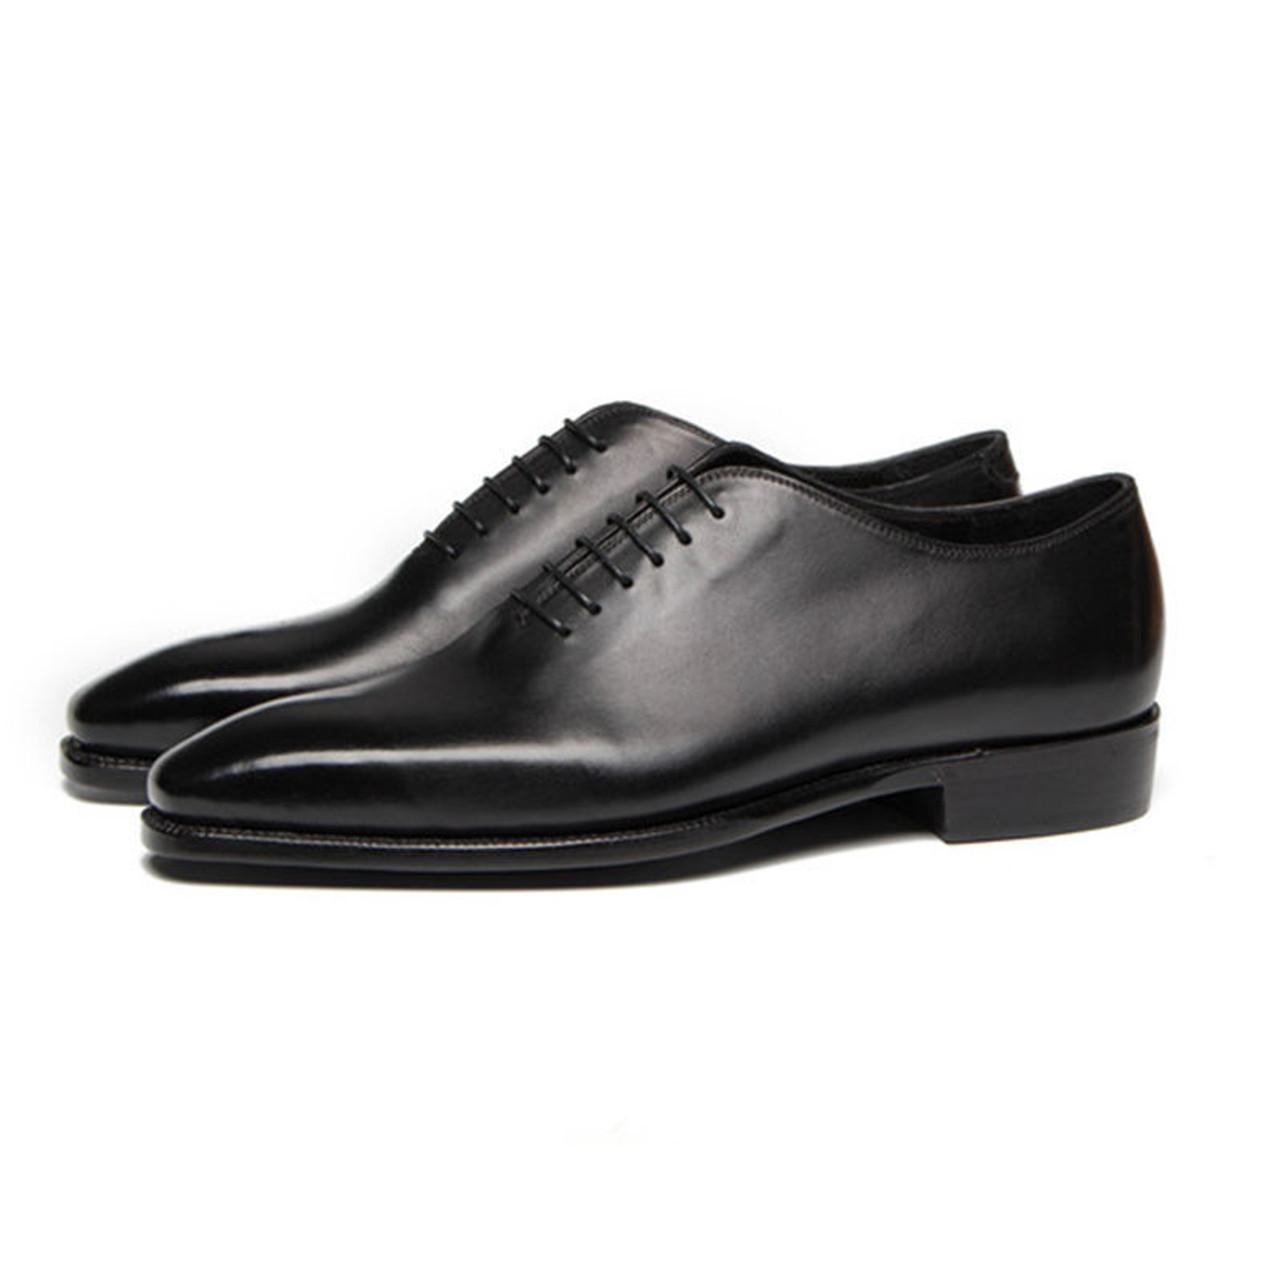 Handmade Italian Leather Mens Shoesmens Dress Shoe Brands